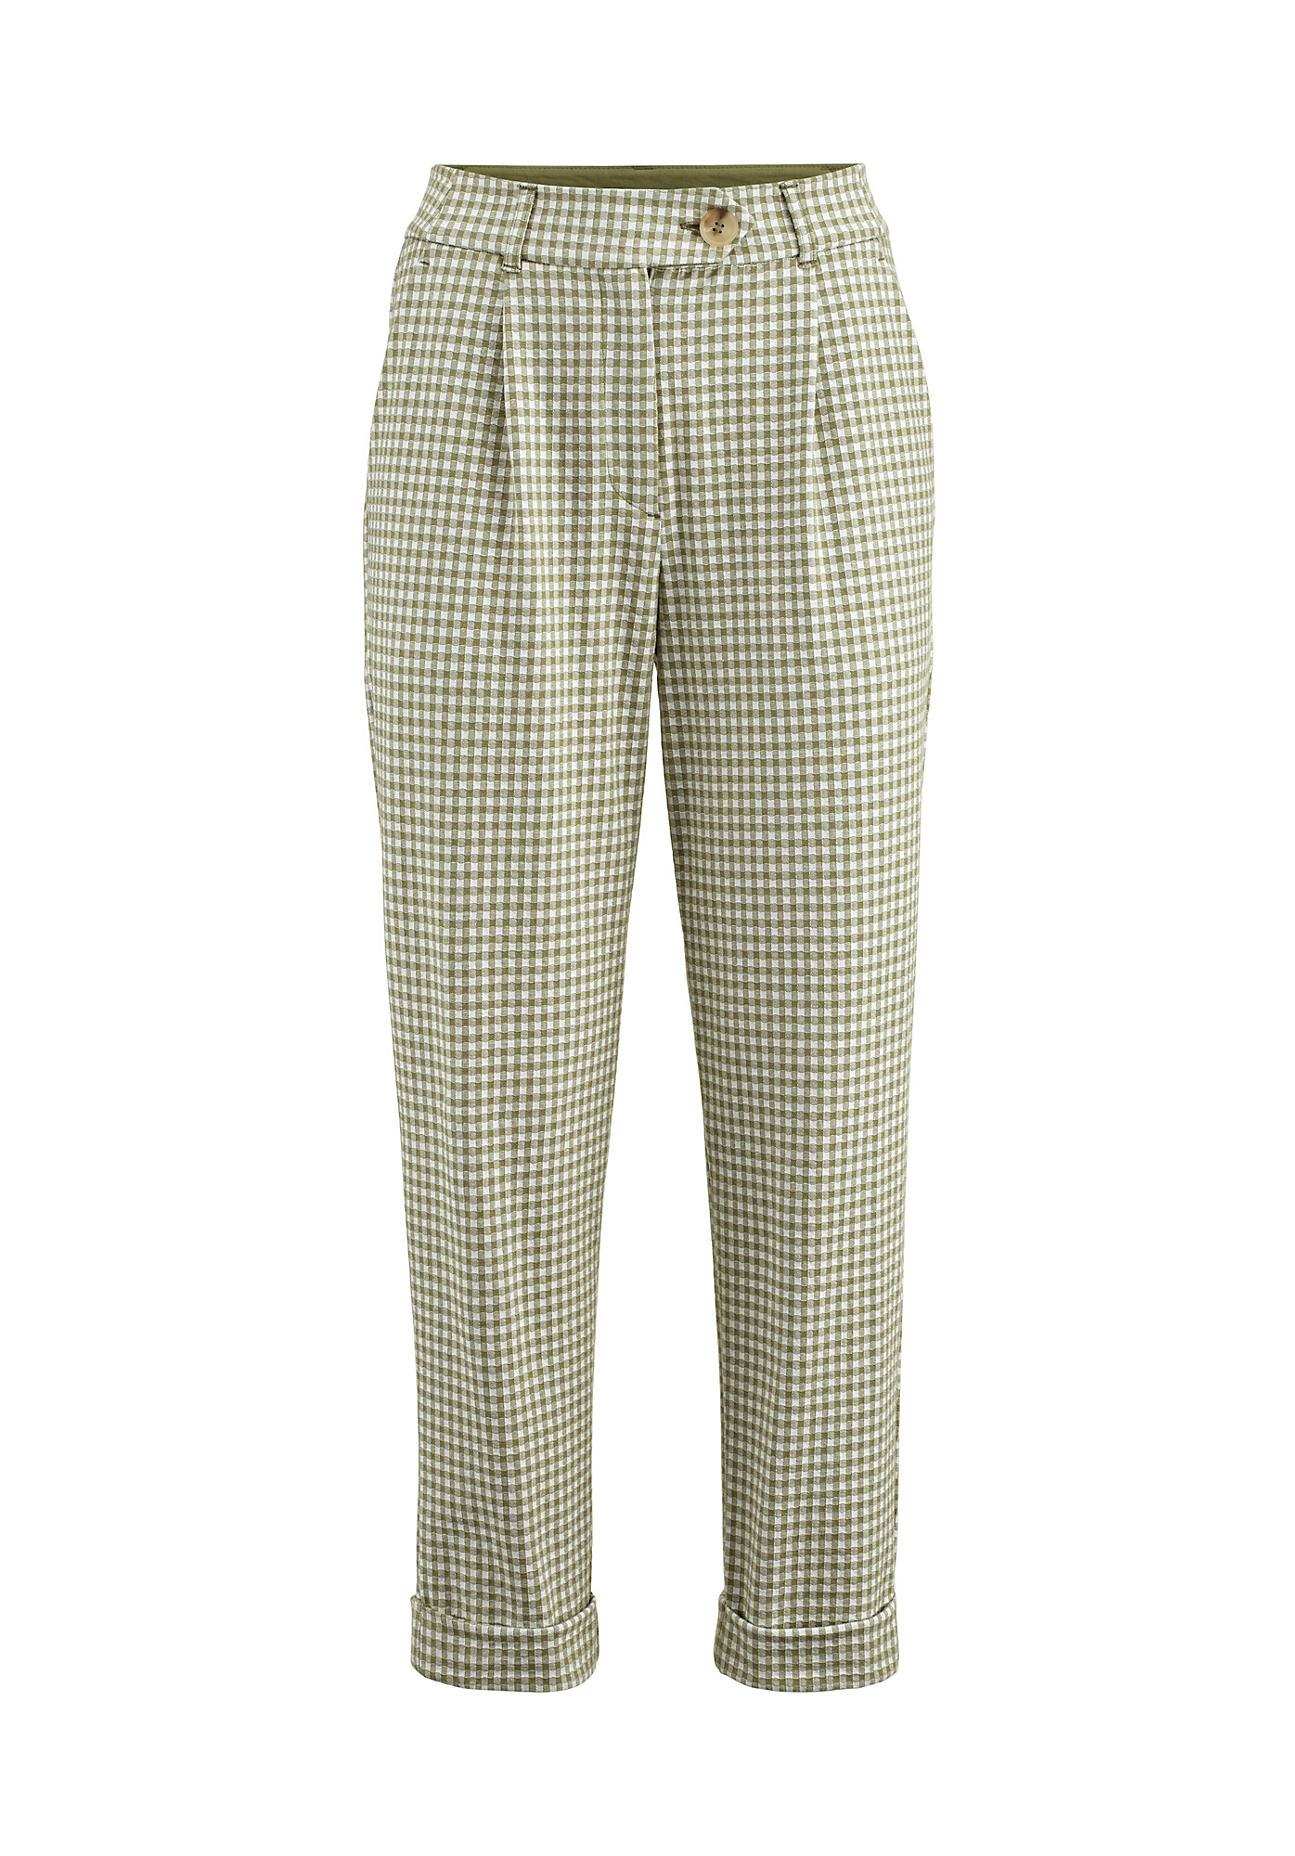 Hosen - hessnatur Damen Jersey Hose aus Bio Baumwolle – grün –  - Onlineshop Hessnatur